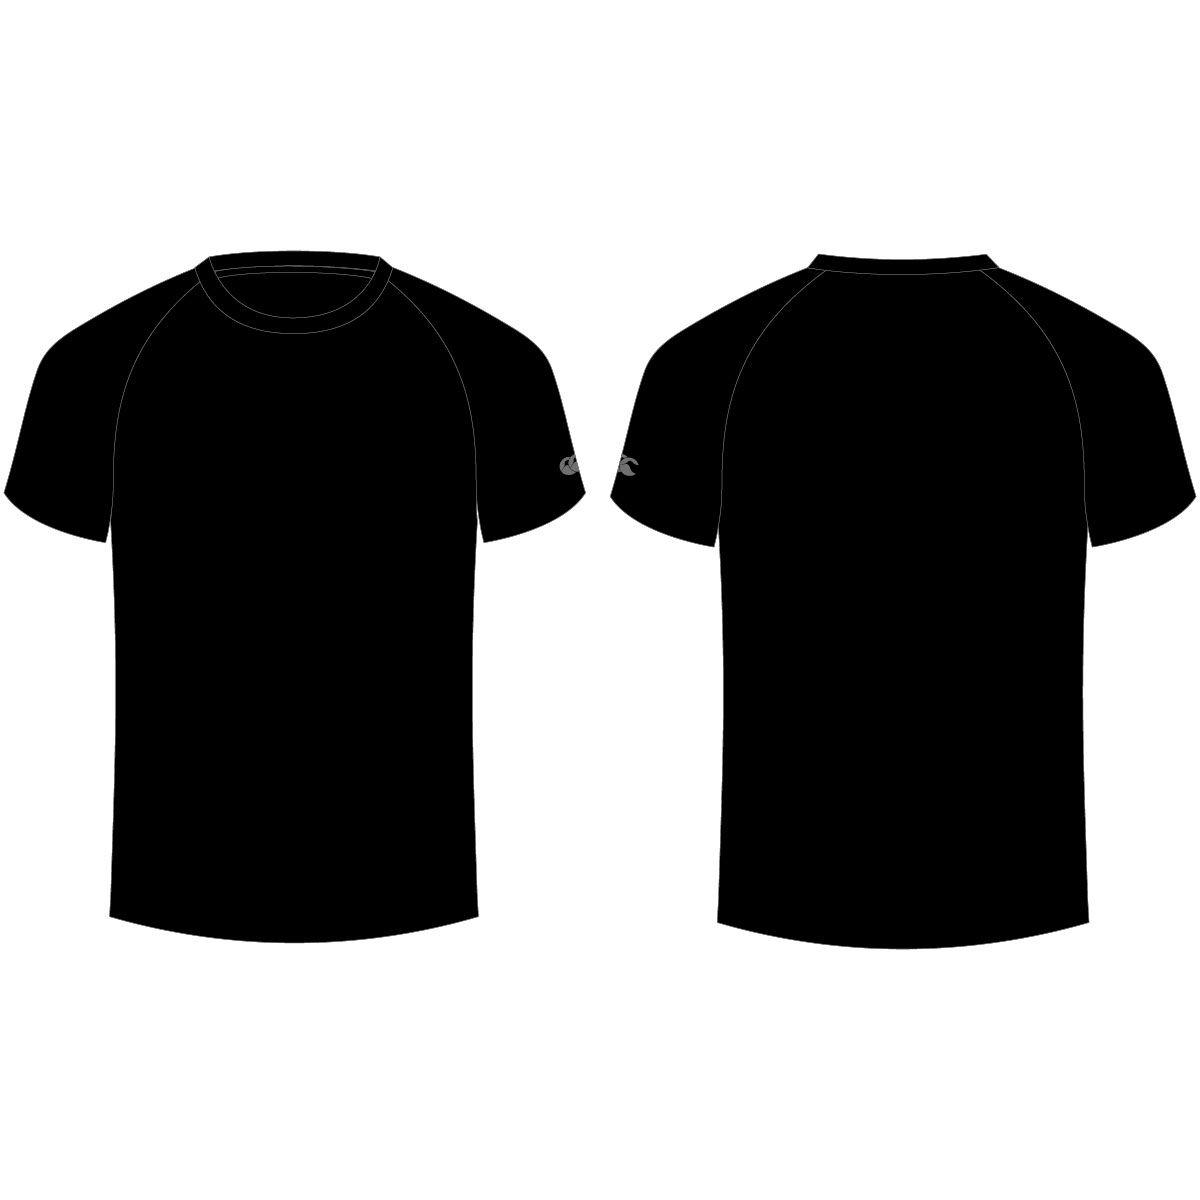 Black T Shirt Plain Back Baju Kaos Kaos Desain Pakaian